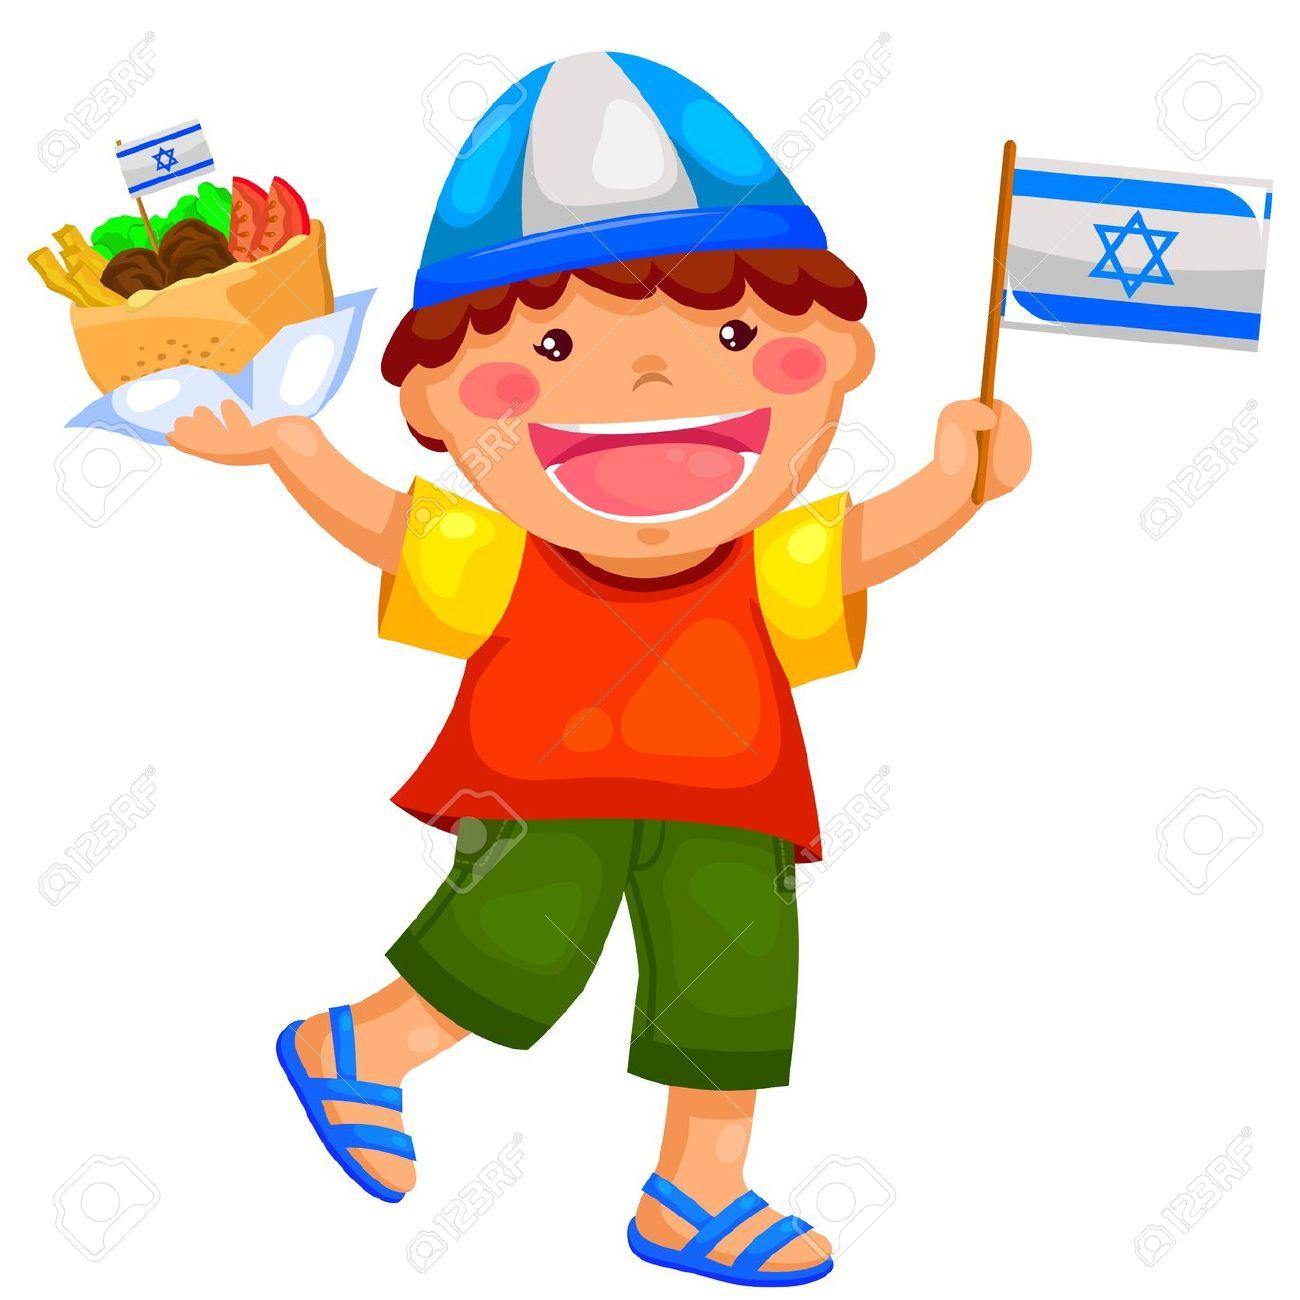 clipart israel flag - photo #14